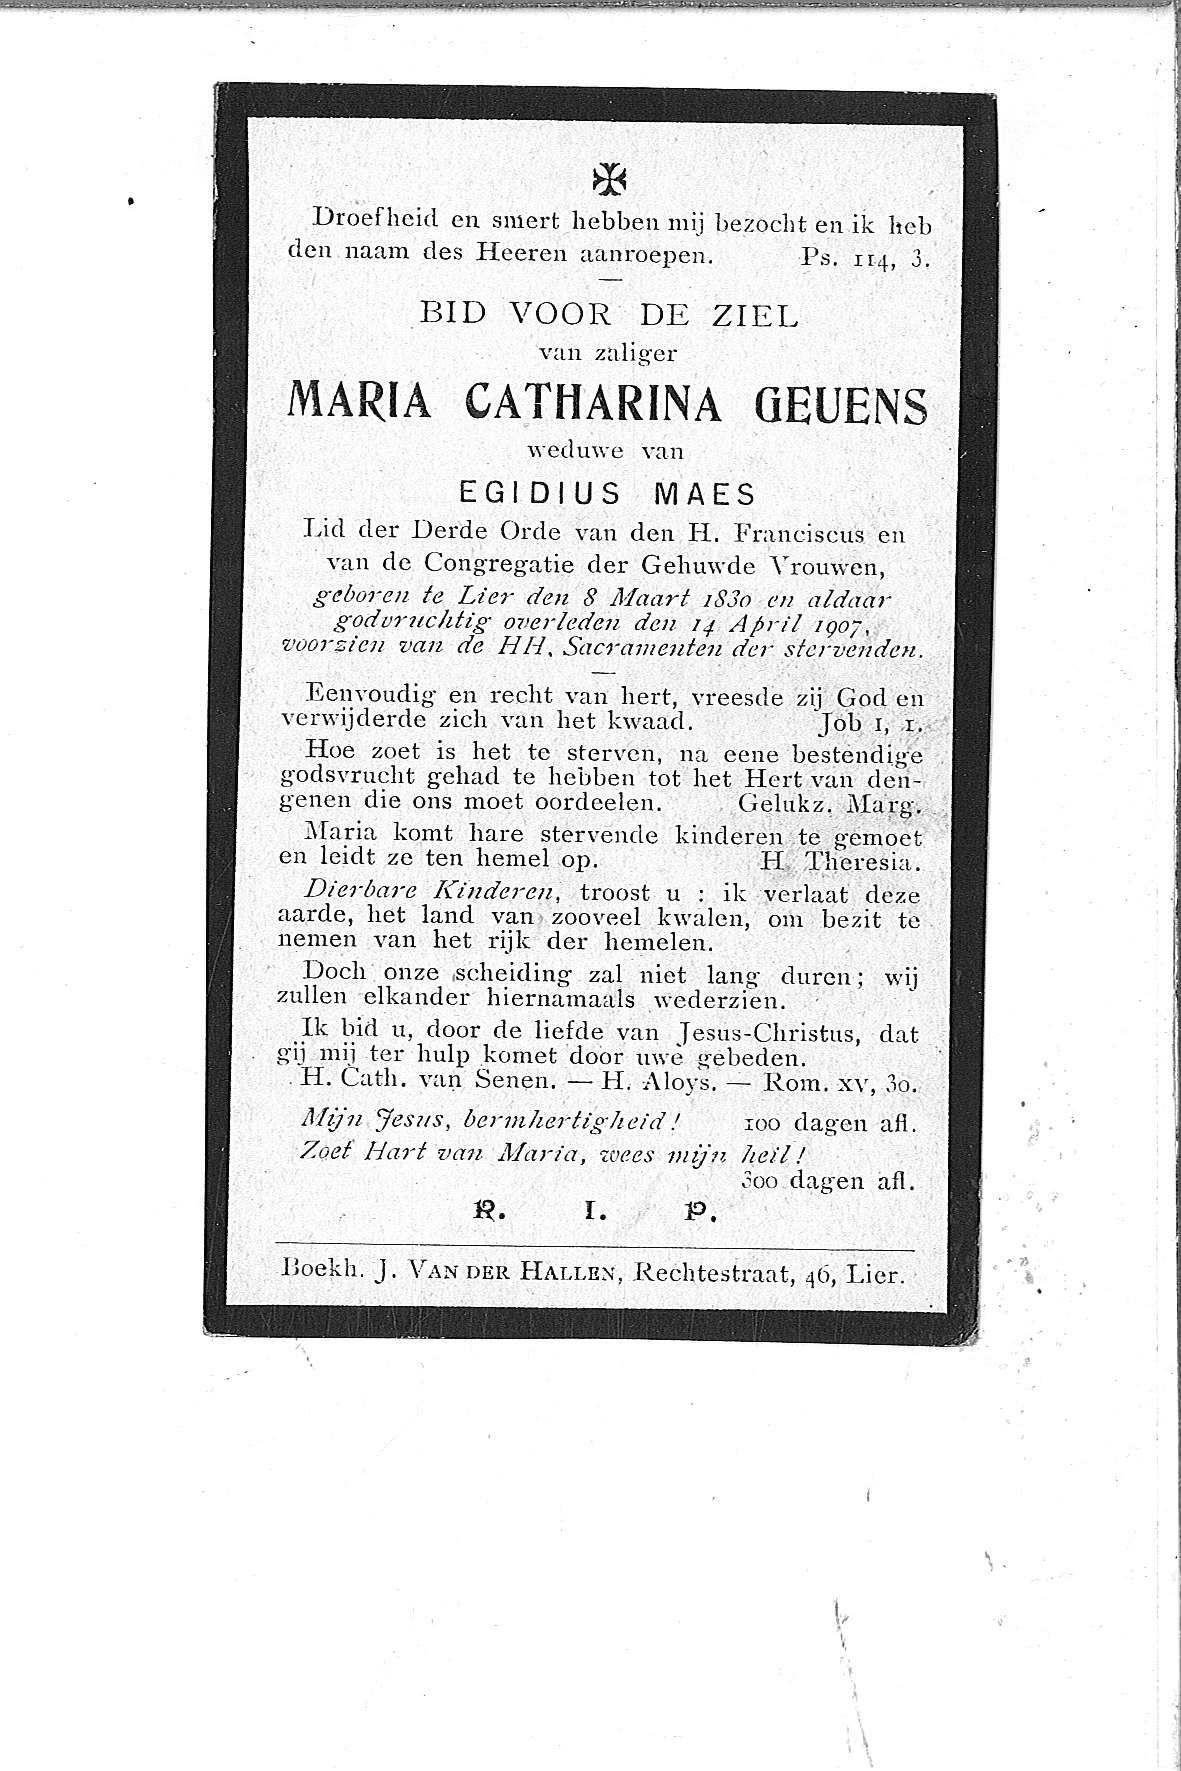 Maria - Catharina (1907)20131210144048_00023.jpg